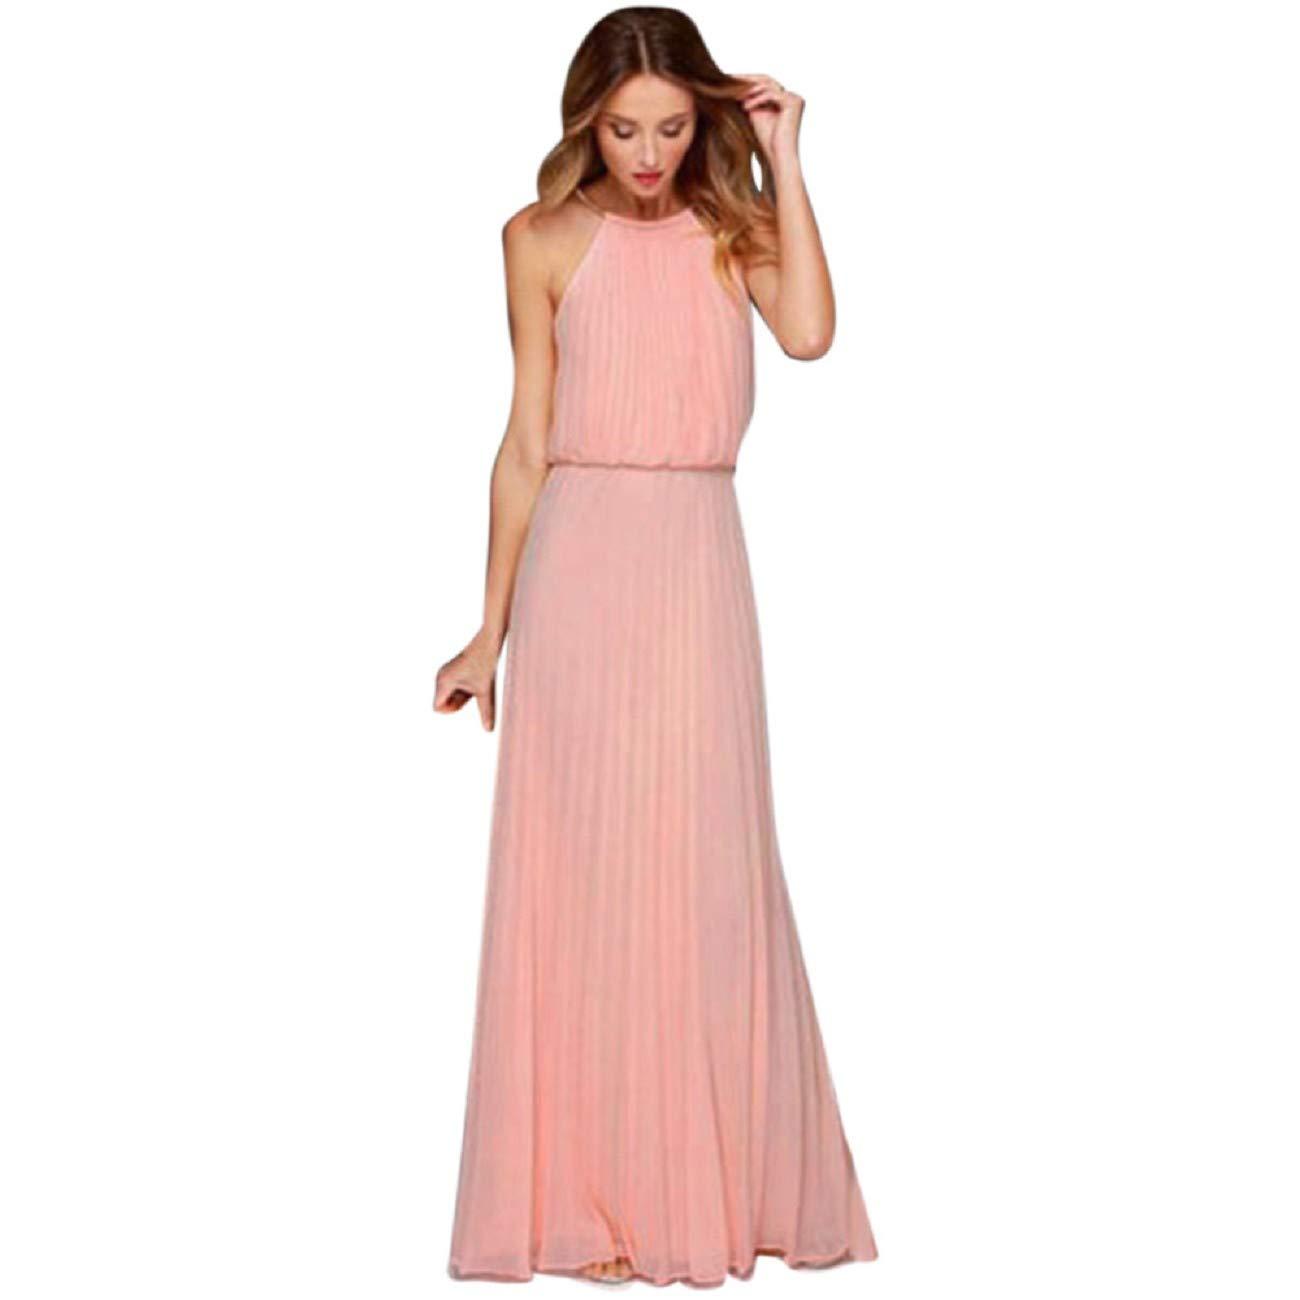 FAPIZI Womens Chiffon Halter Sleeveless Formal Evening Bridesmaid Dresses Party Ball Prom Gown Elegant Maxi Dress Pink